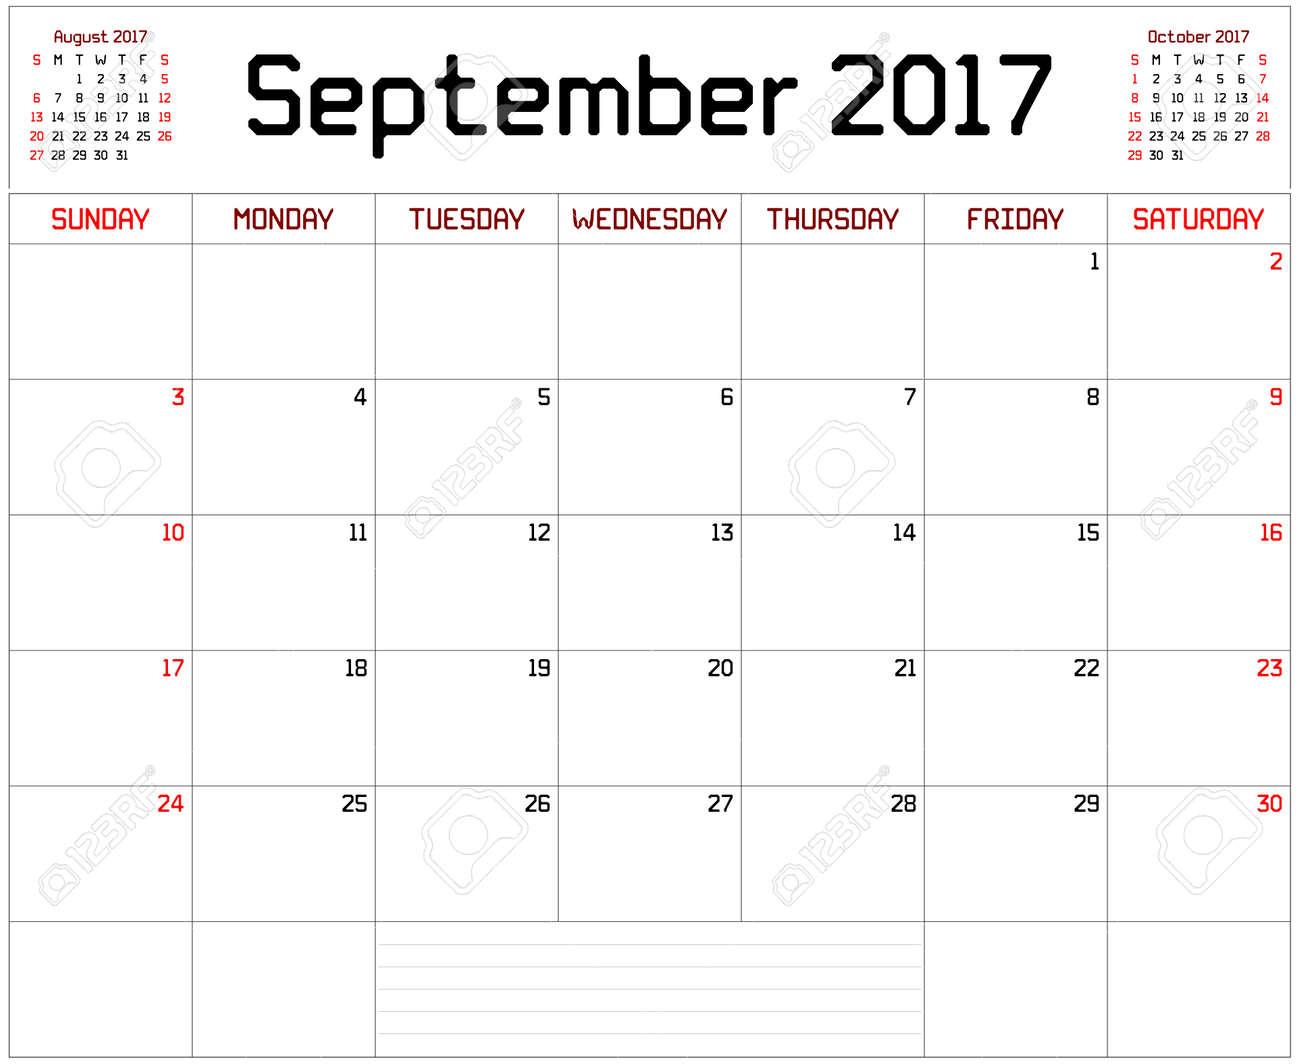 year 2017 september planner a monthly planner calendar for